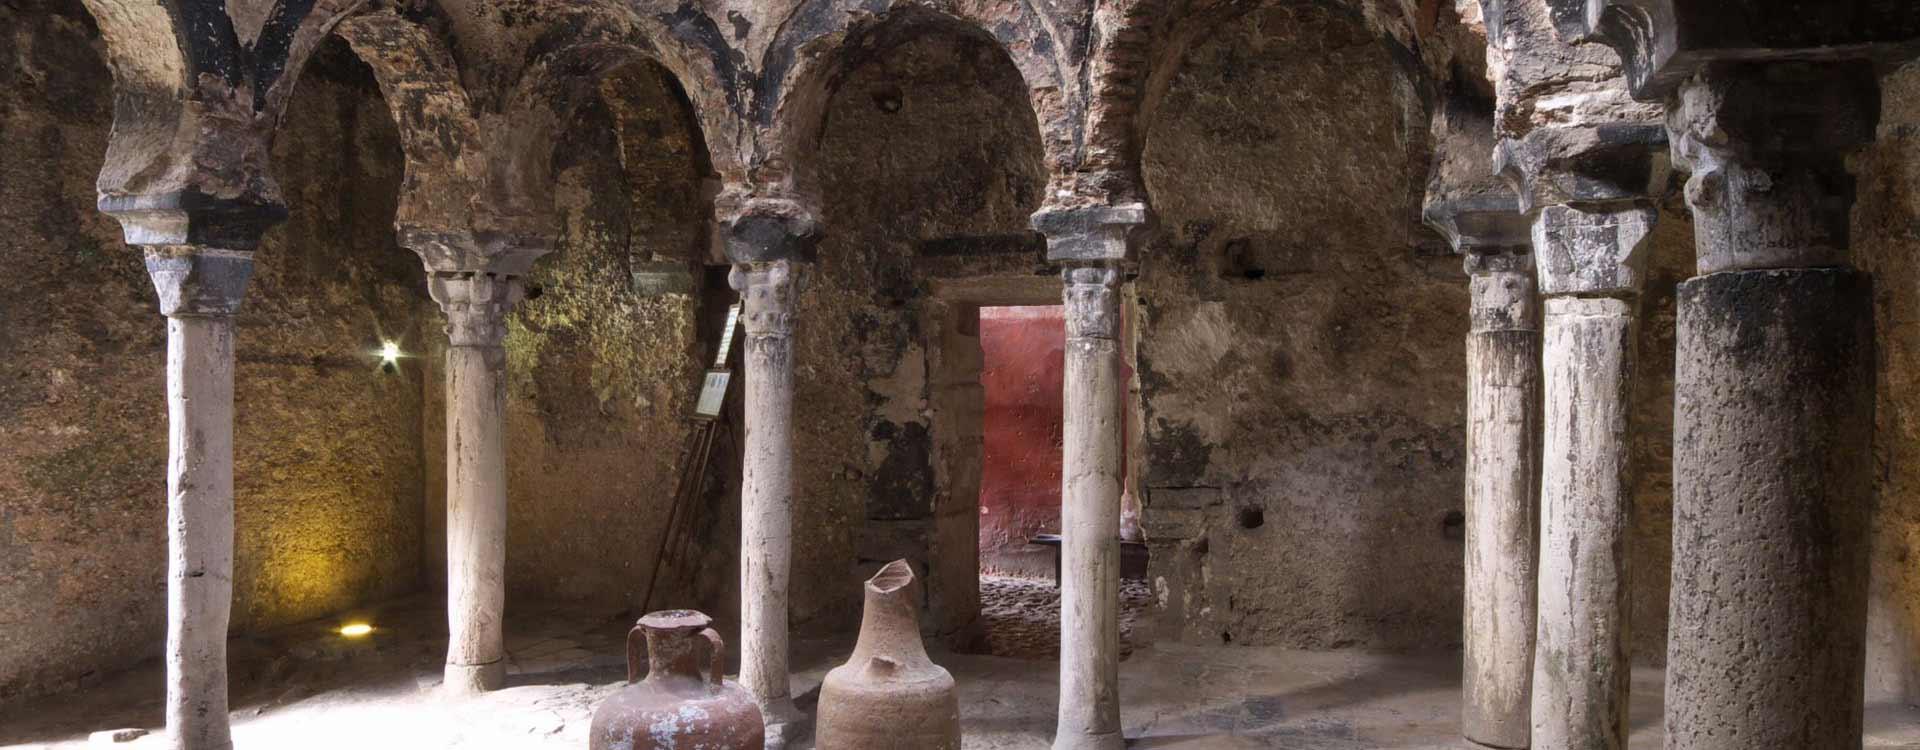 Sala de baños calientes de los baños árabes de Mallorca